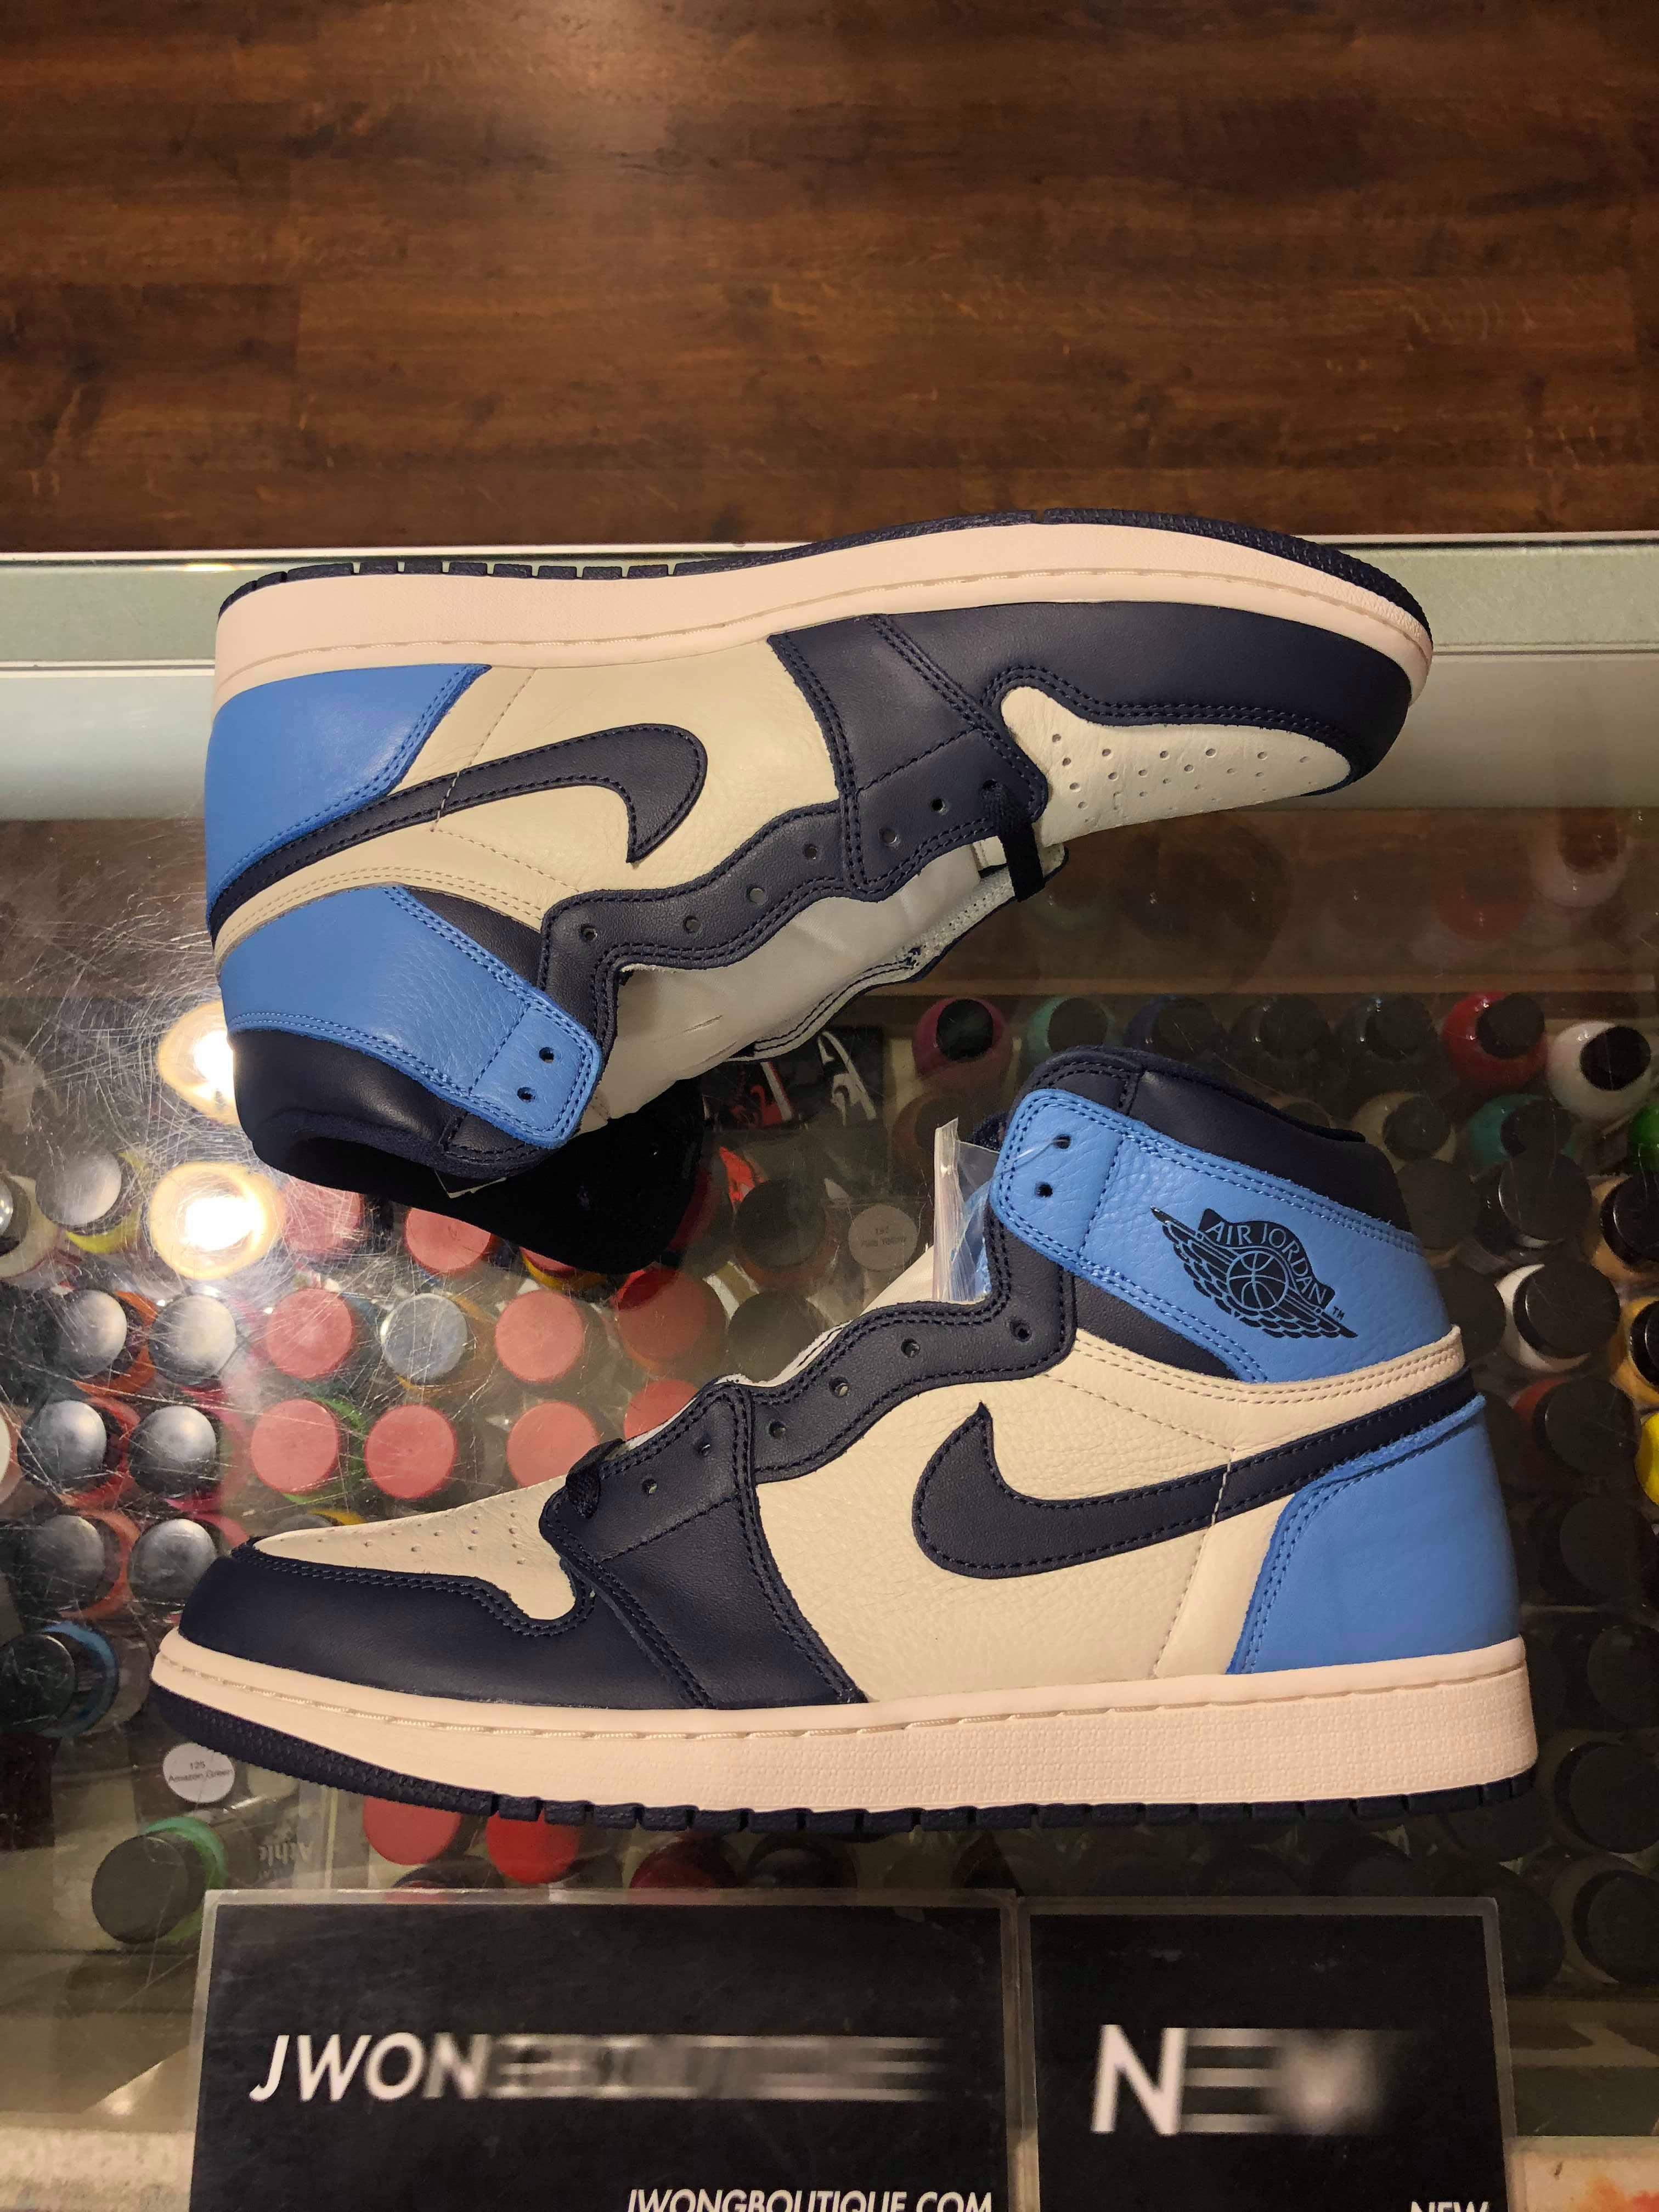 2019 Nike Air Jordan I Retro High Obsidian Unc Youth Jwong Boutique